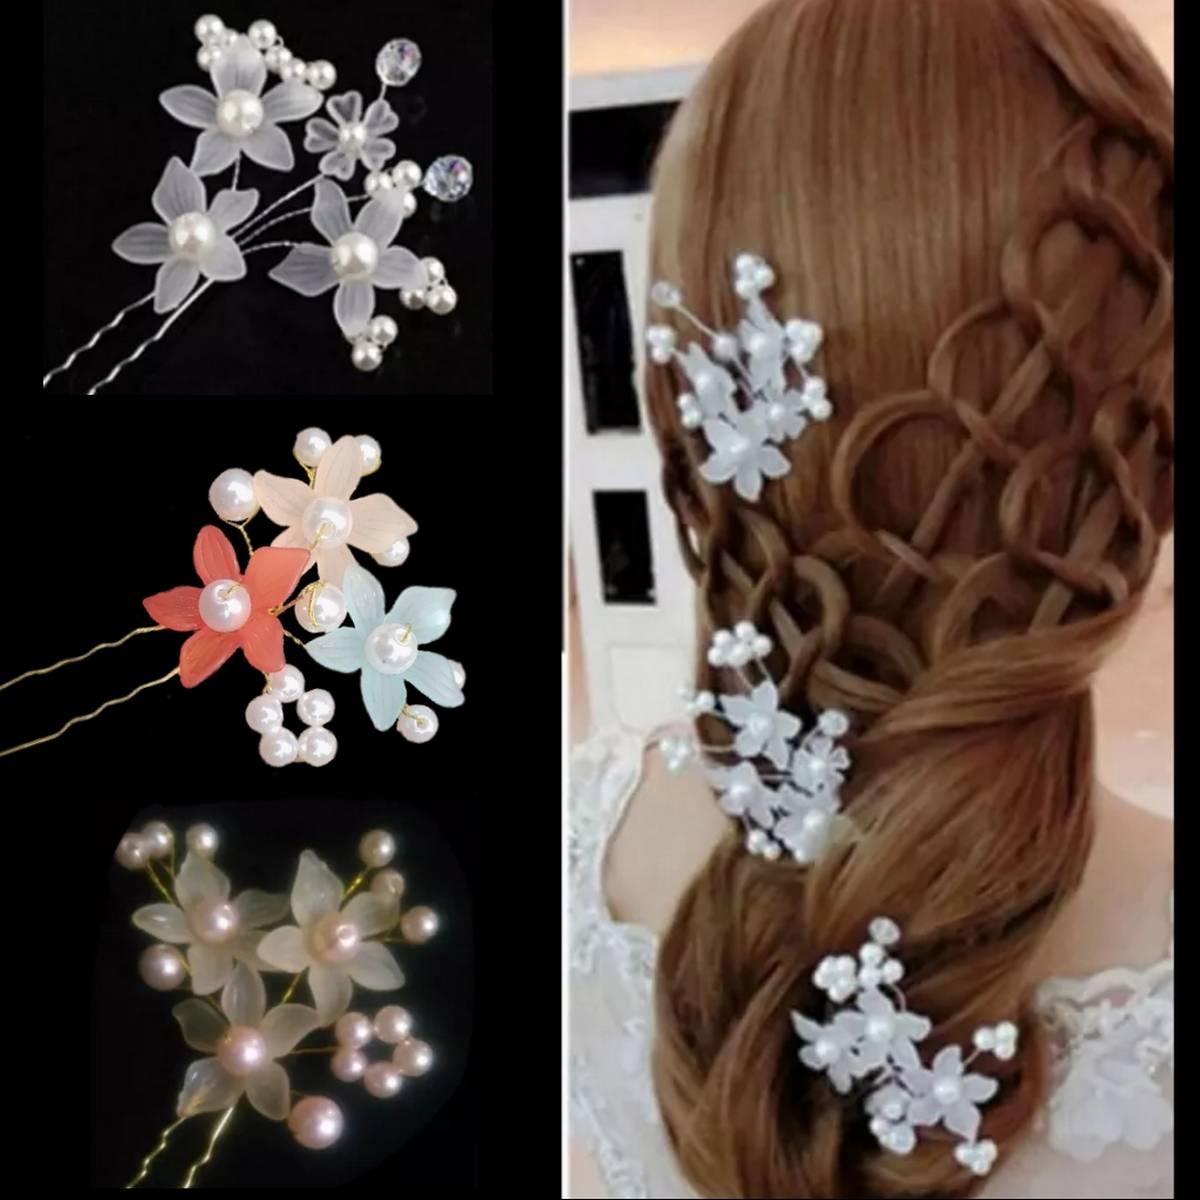 Pack of 3 Fancy Hair pins Large U Shape Pins,Jura Pins, Braide Flower Pins & Bun Pins for Wedding Bride Party Hair Accessories